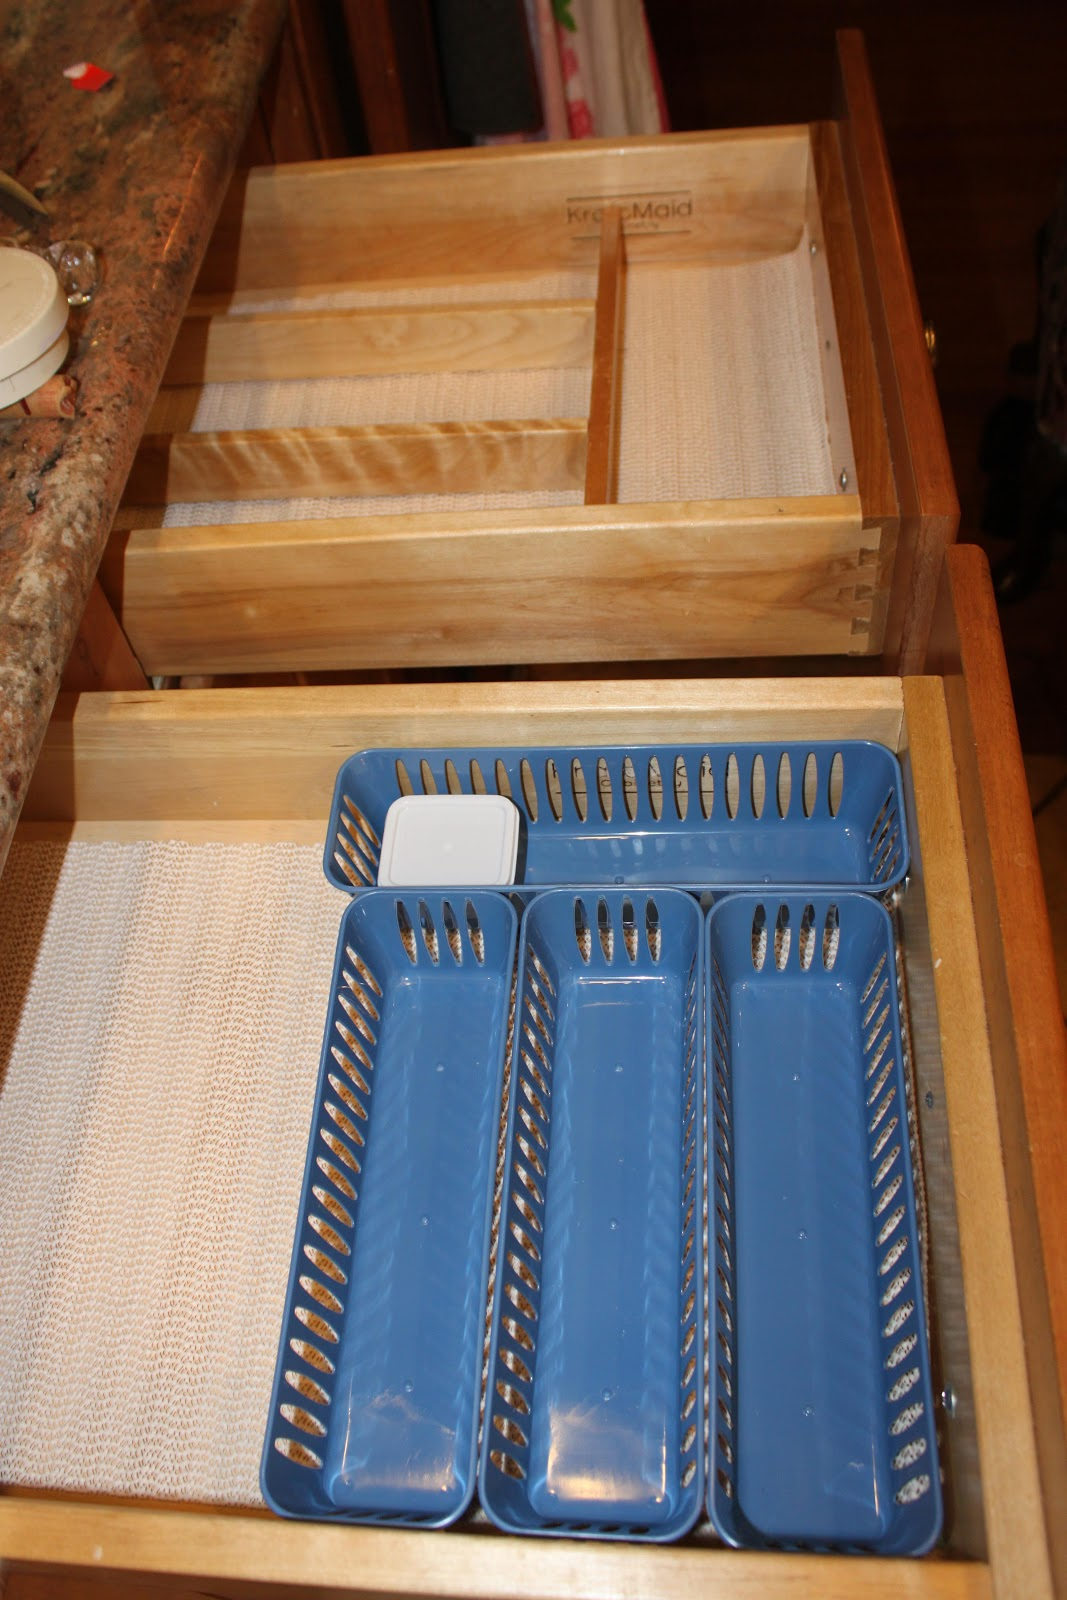 My Great Challenge: Organizing Kitchen Drawers